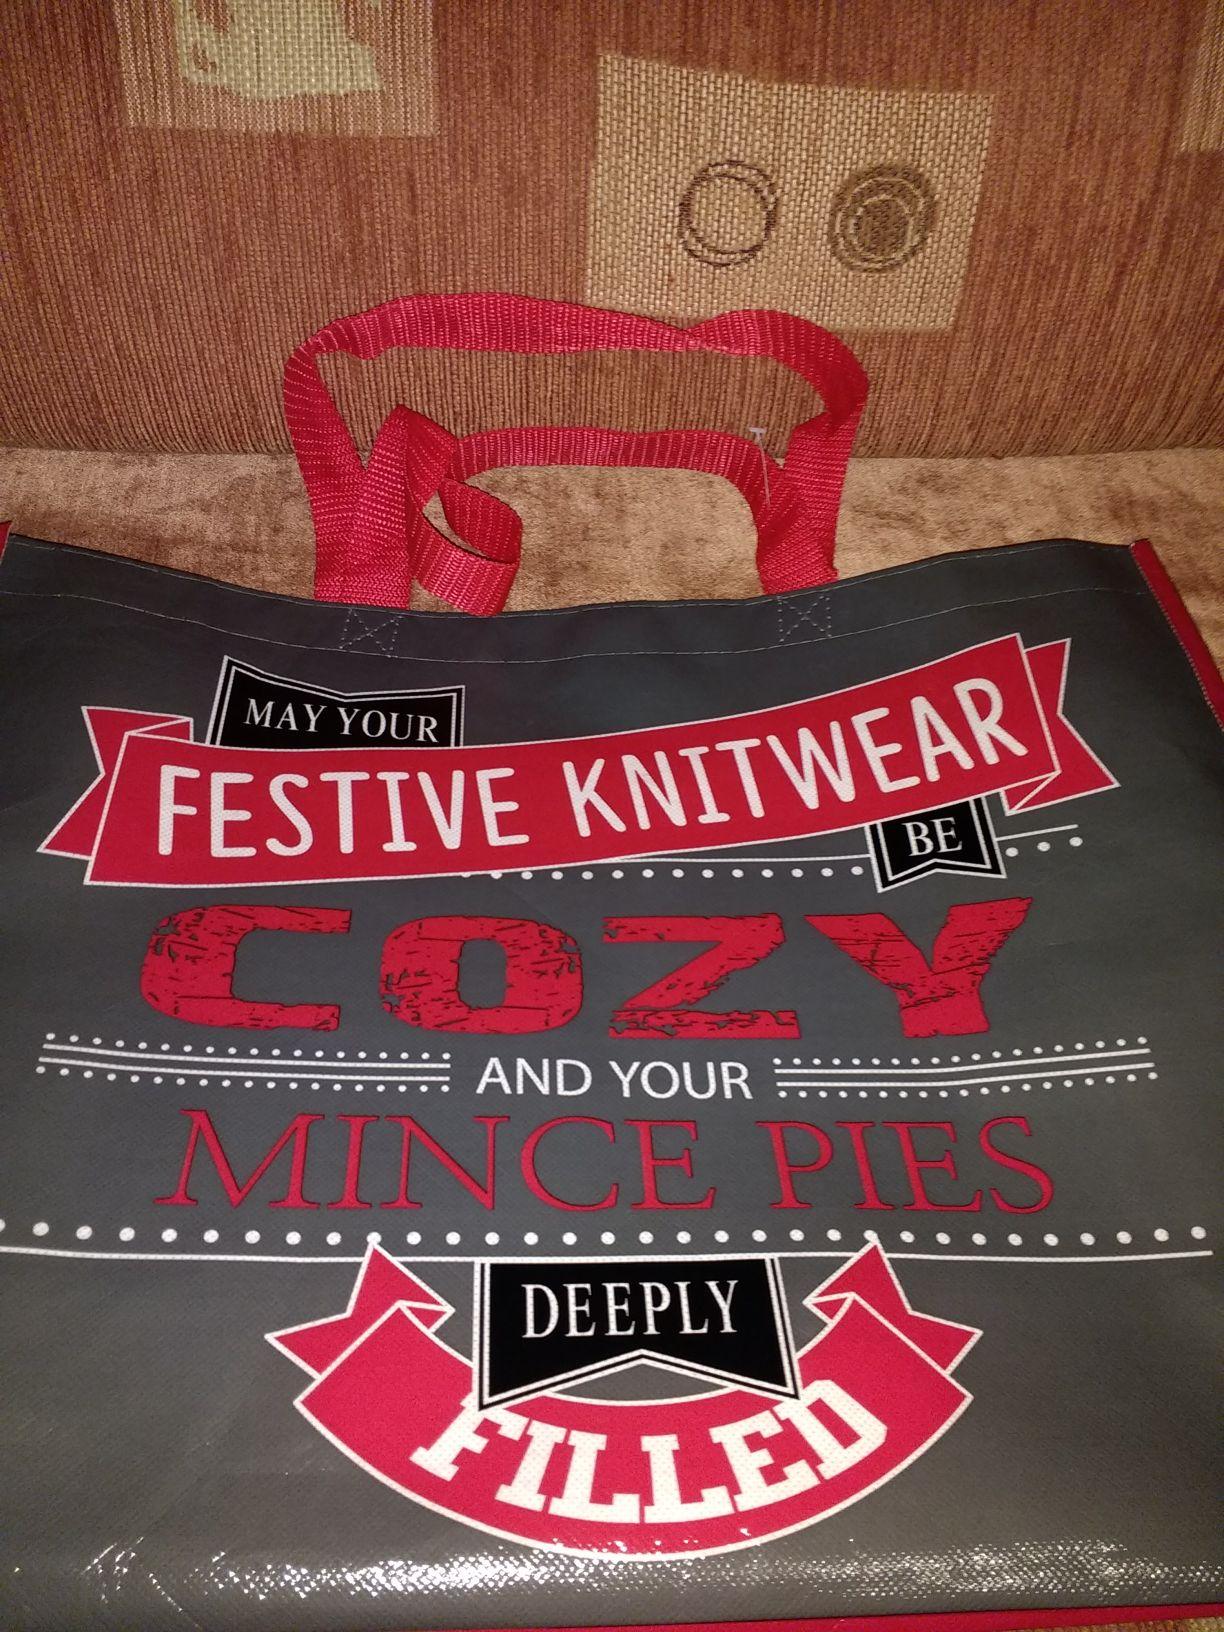 Festive bag for life instore at Poundland for 25p